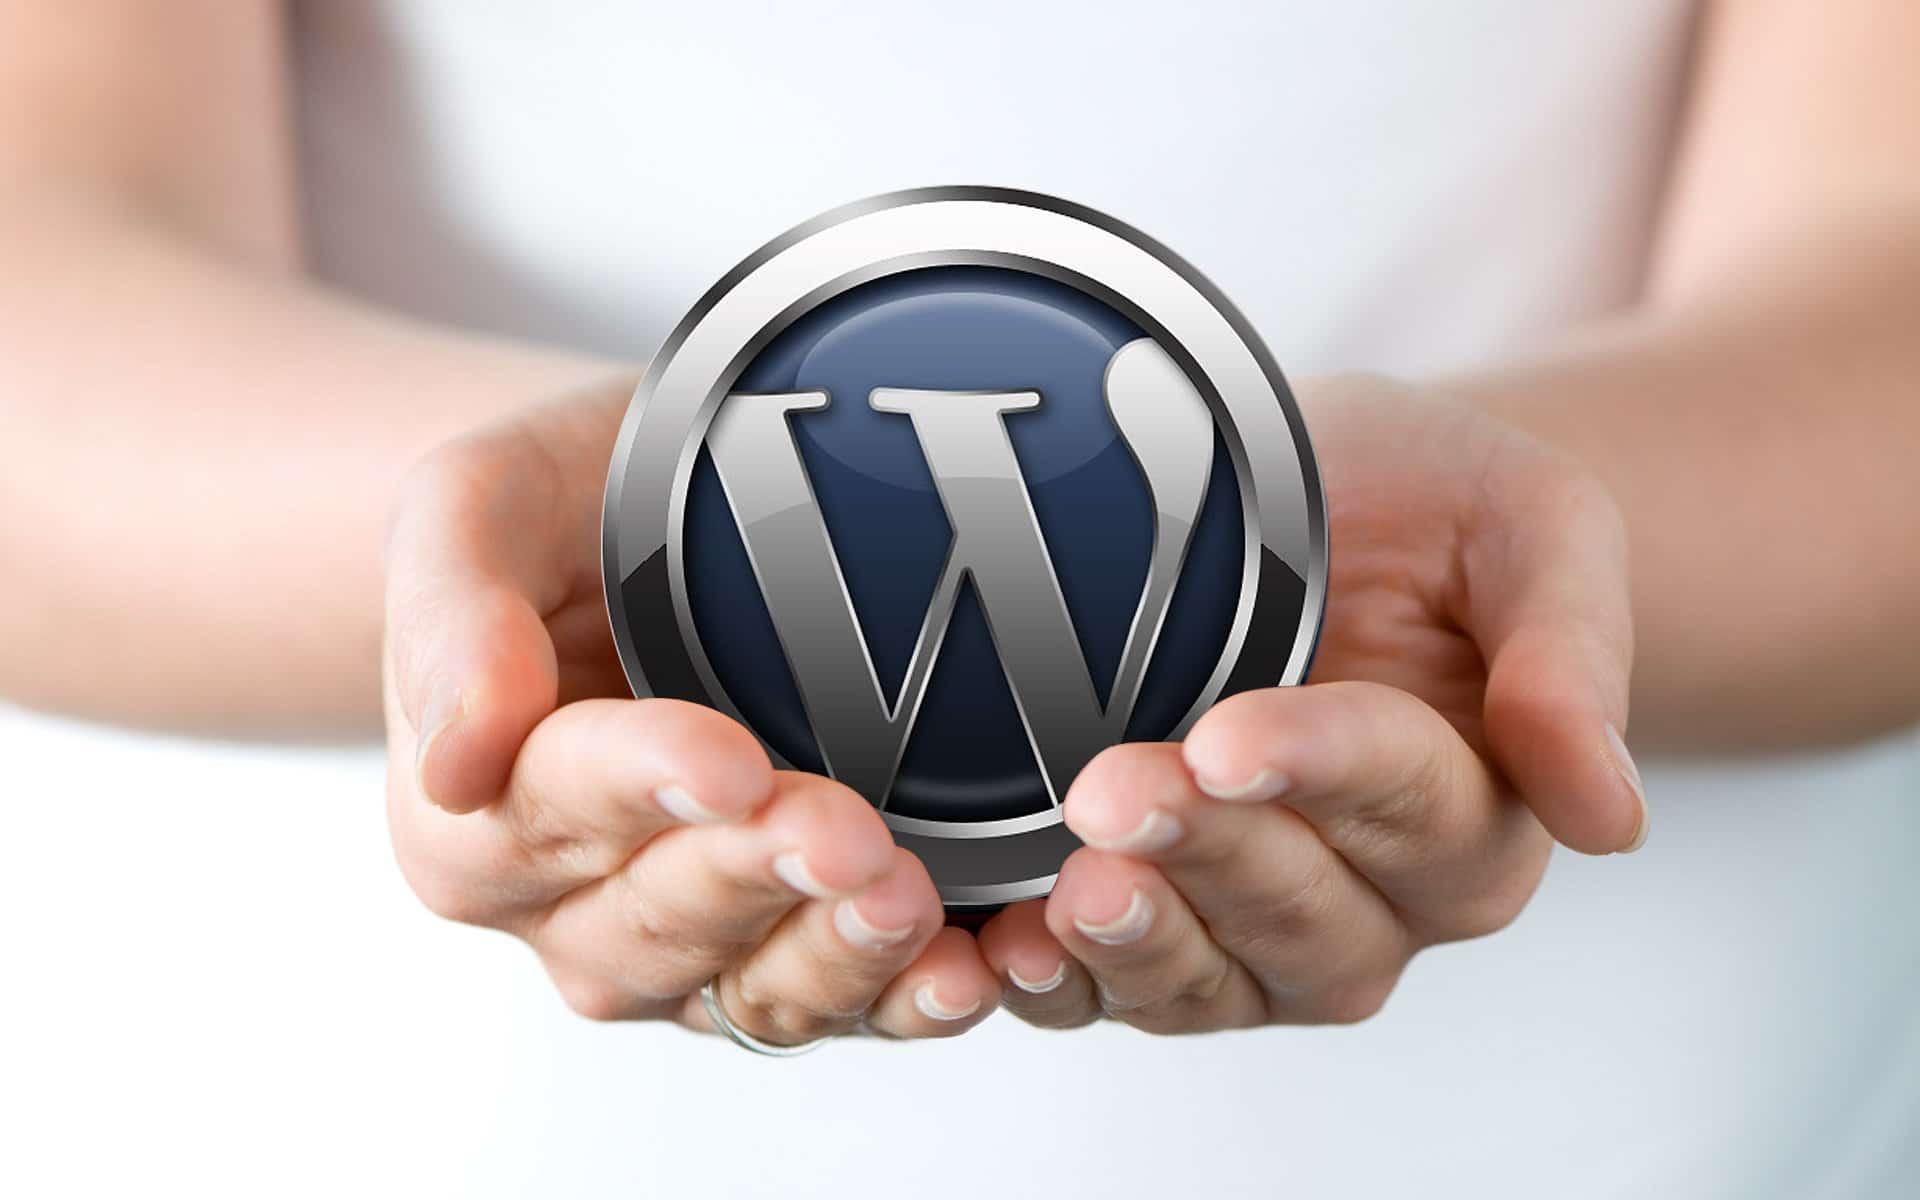 Создание сайтов на WordPress: установка и поиск шаблона